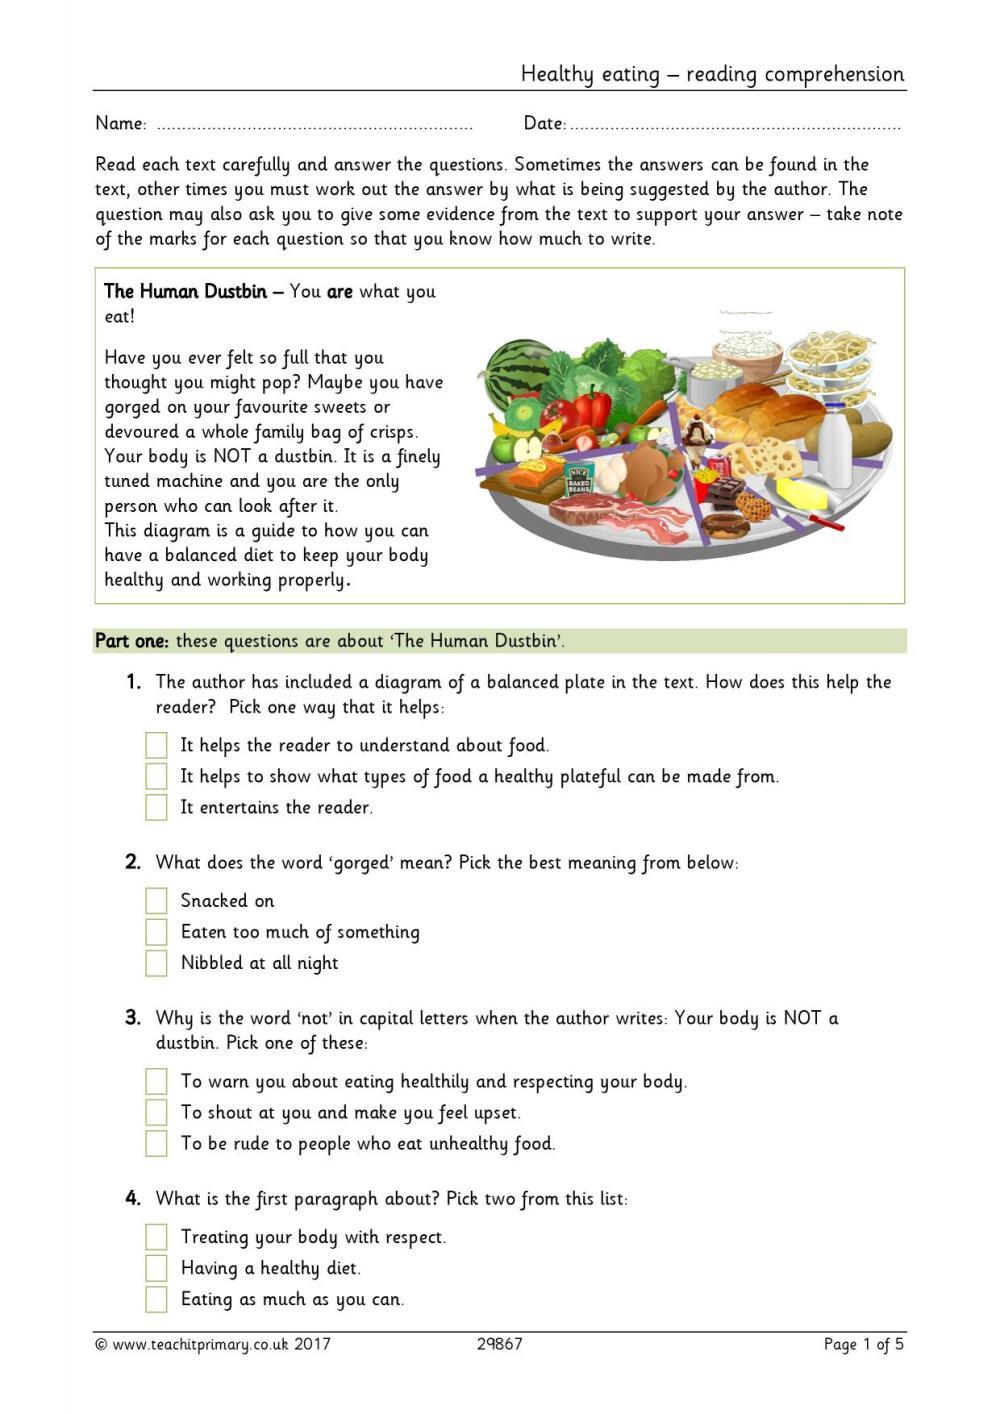 medium resolution of Healthy eating - reading comprehension   Food   Lifestyle   Health   KS2    PDF